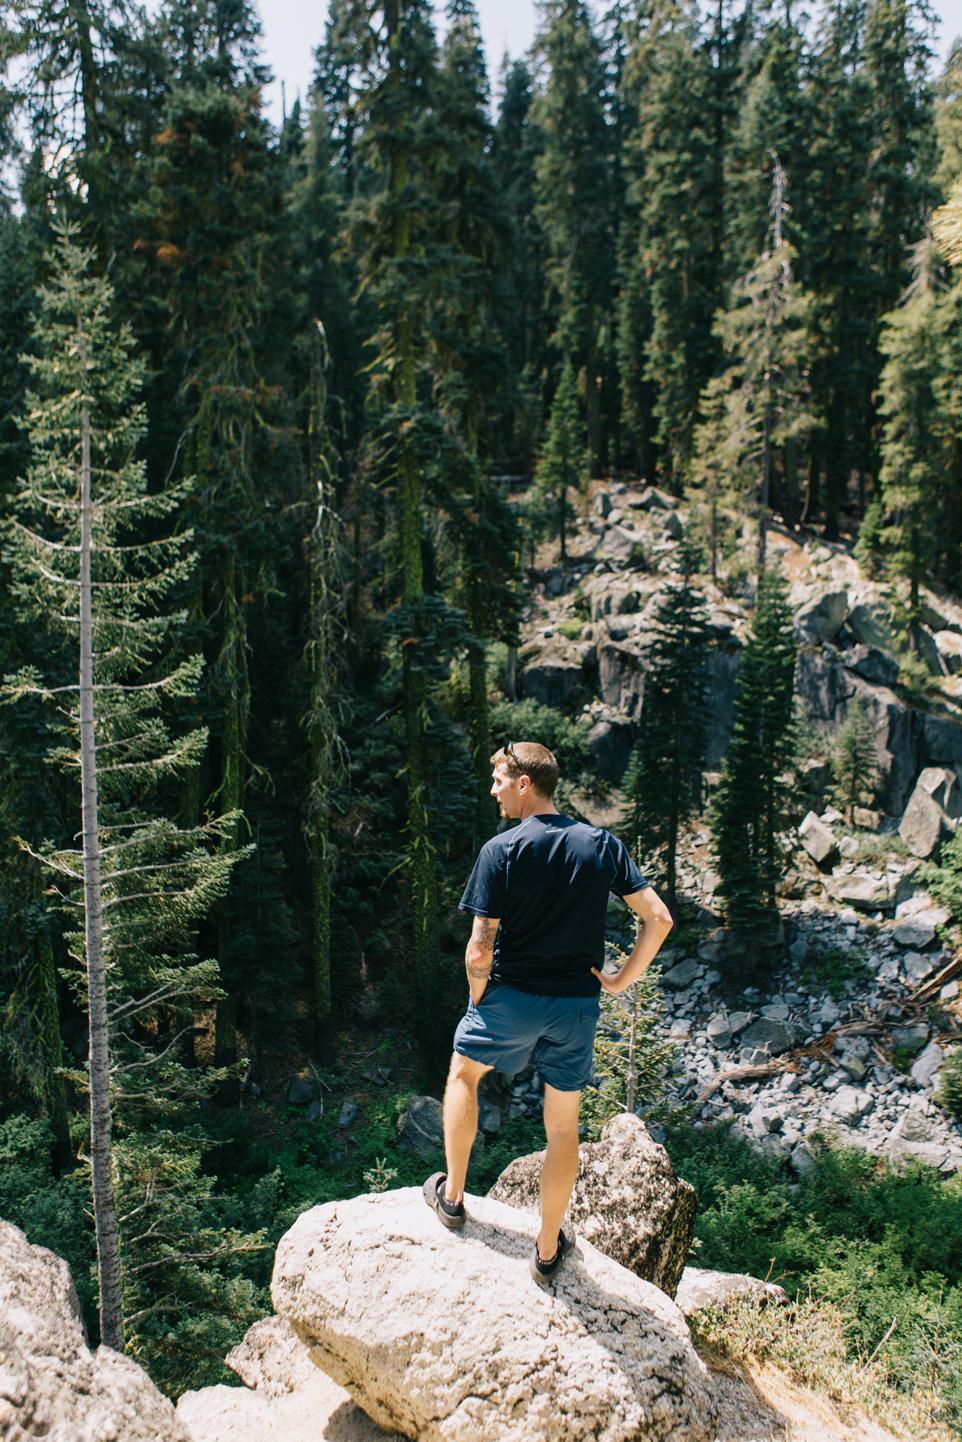 CindyGiovagnoli_outdoors_photographer_Sierra_Buttes_firetower_watchtower_Sardine_Snag_Bear_lake_hike_swim_camp-003.jpg